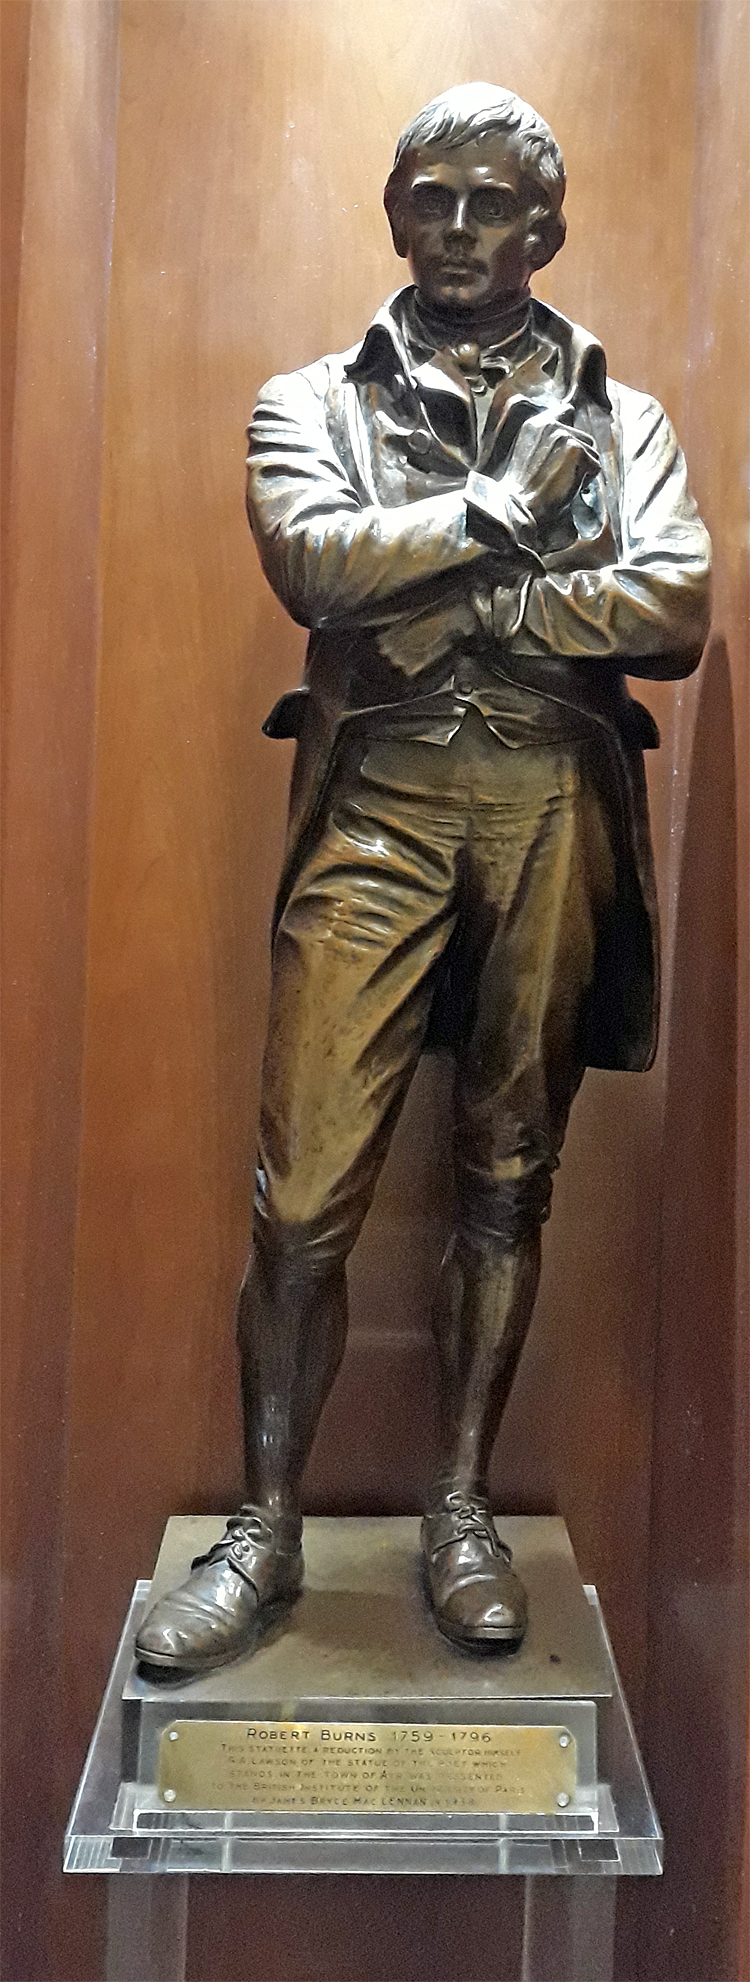 20180122_155930 - Burns Statue at Sorbonne